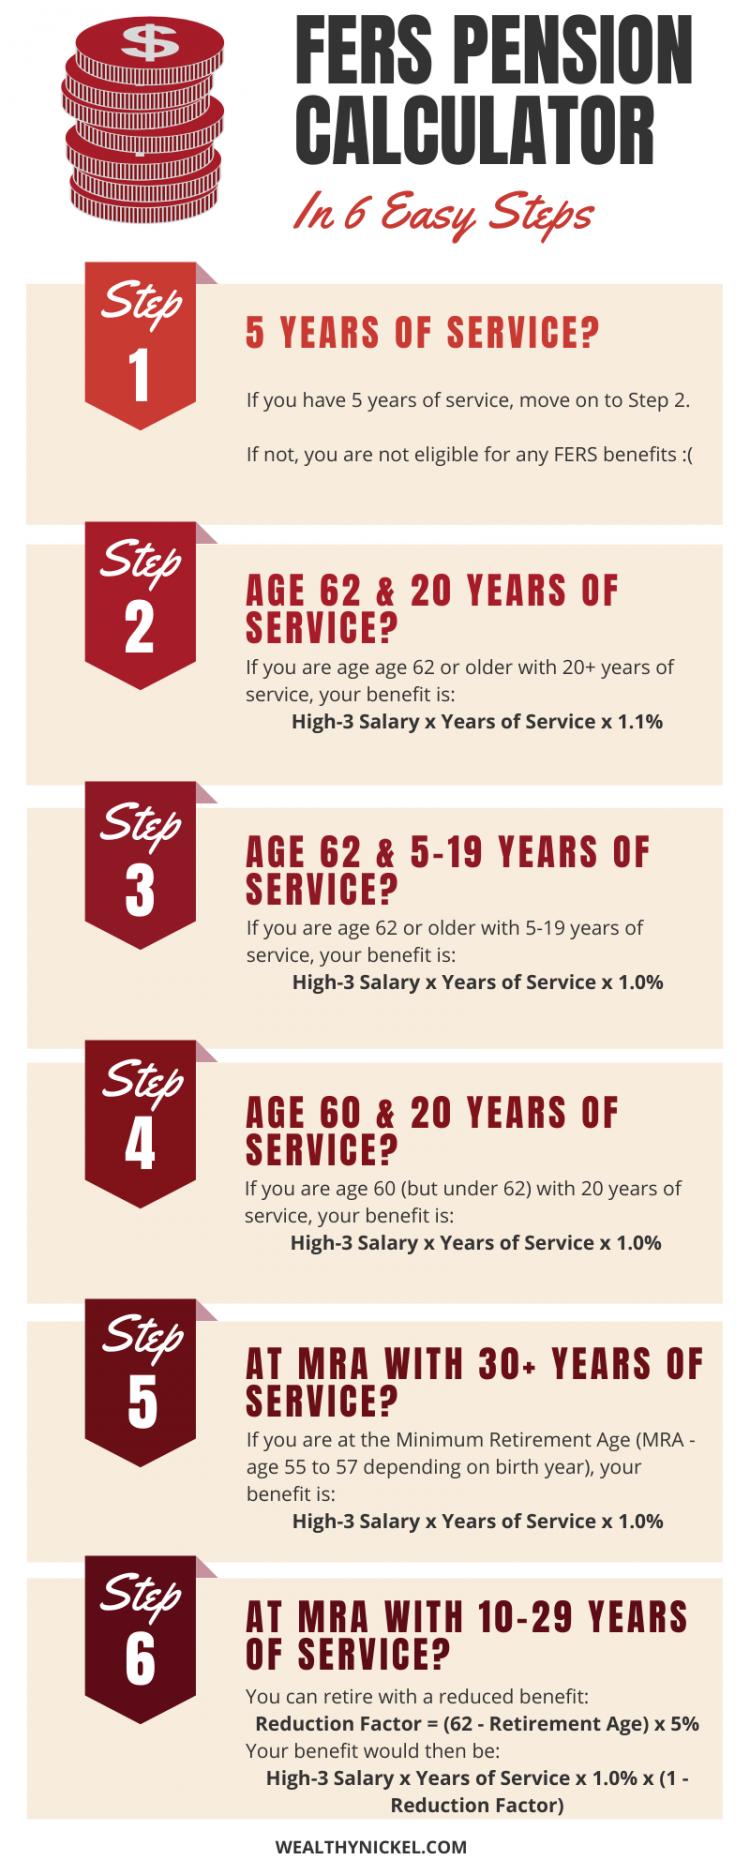 Fers Retirement Calculator 6 Steps To Estimate Your Federal Pension Retirement Calculator Retirement Federal Retirement